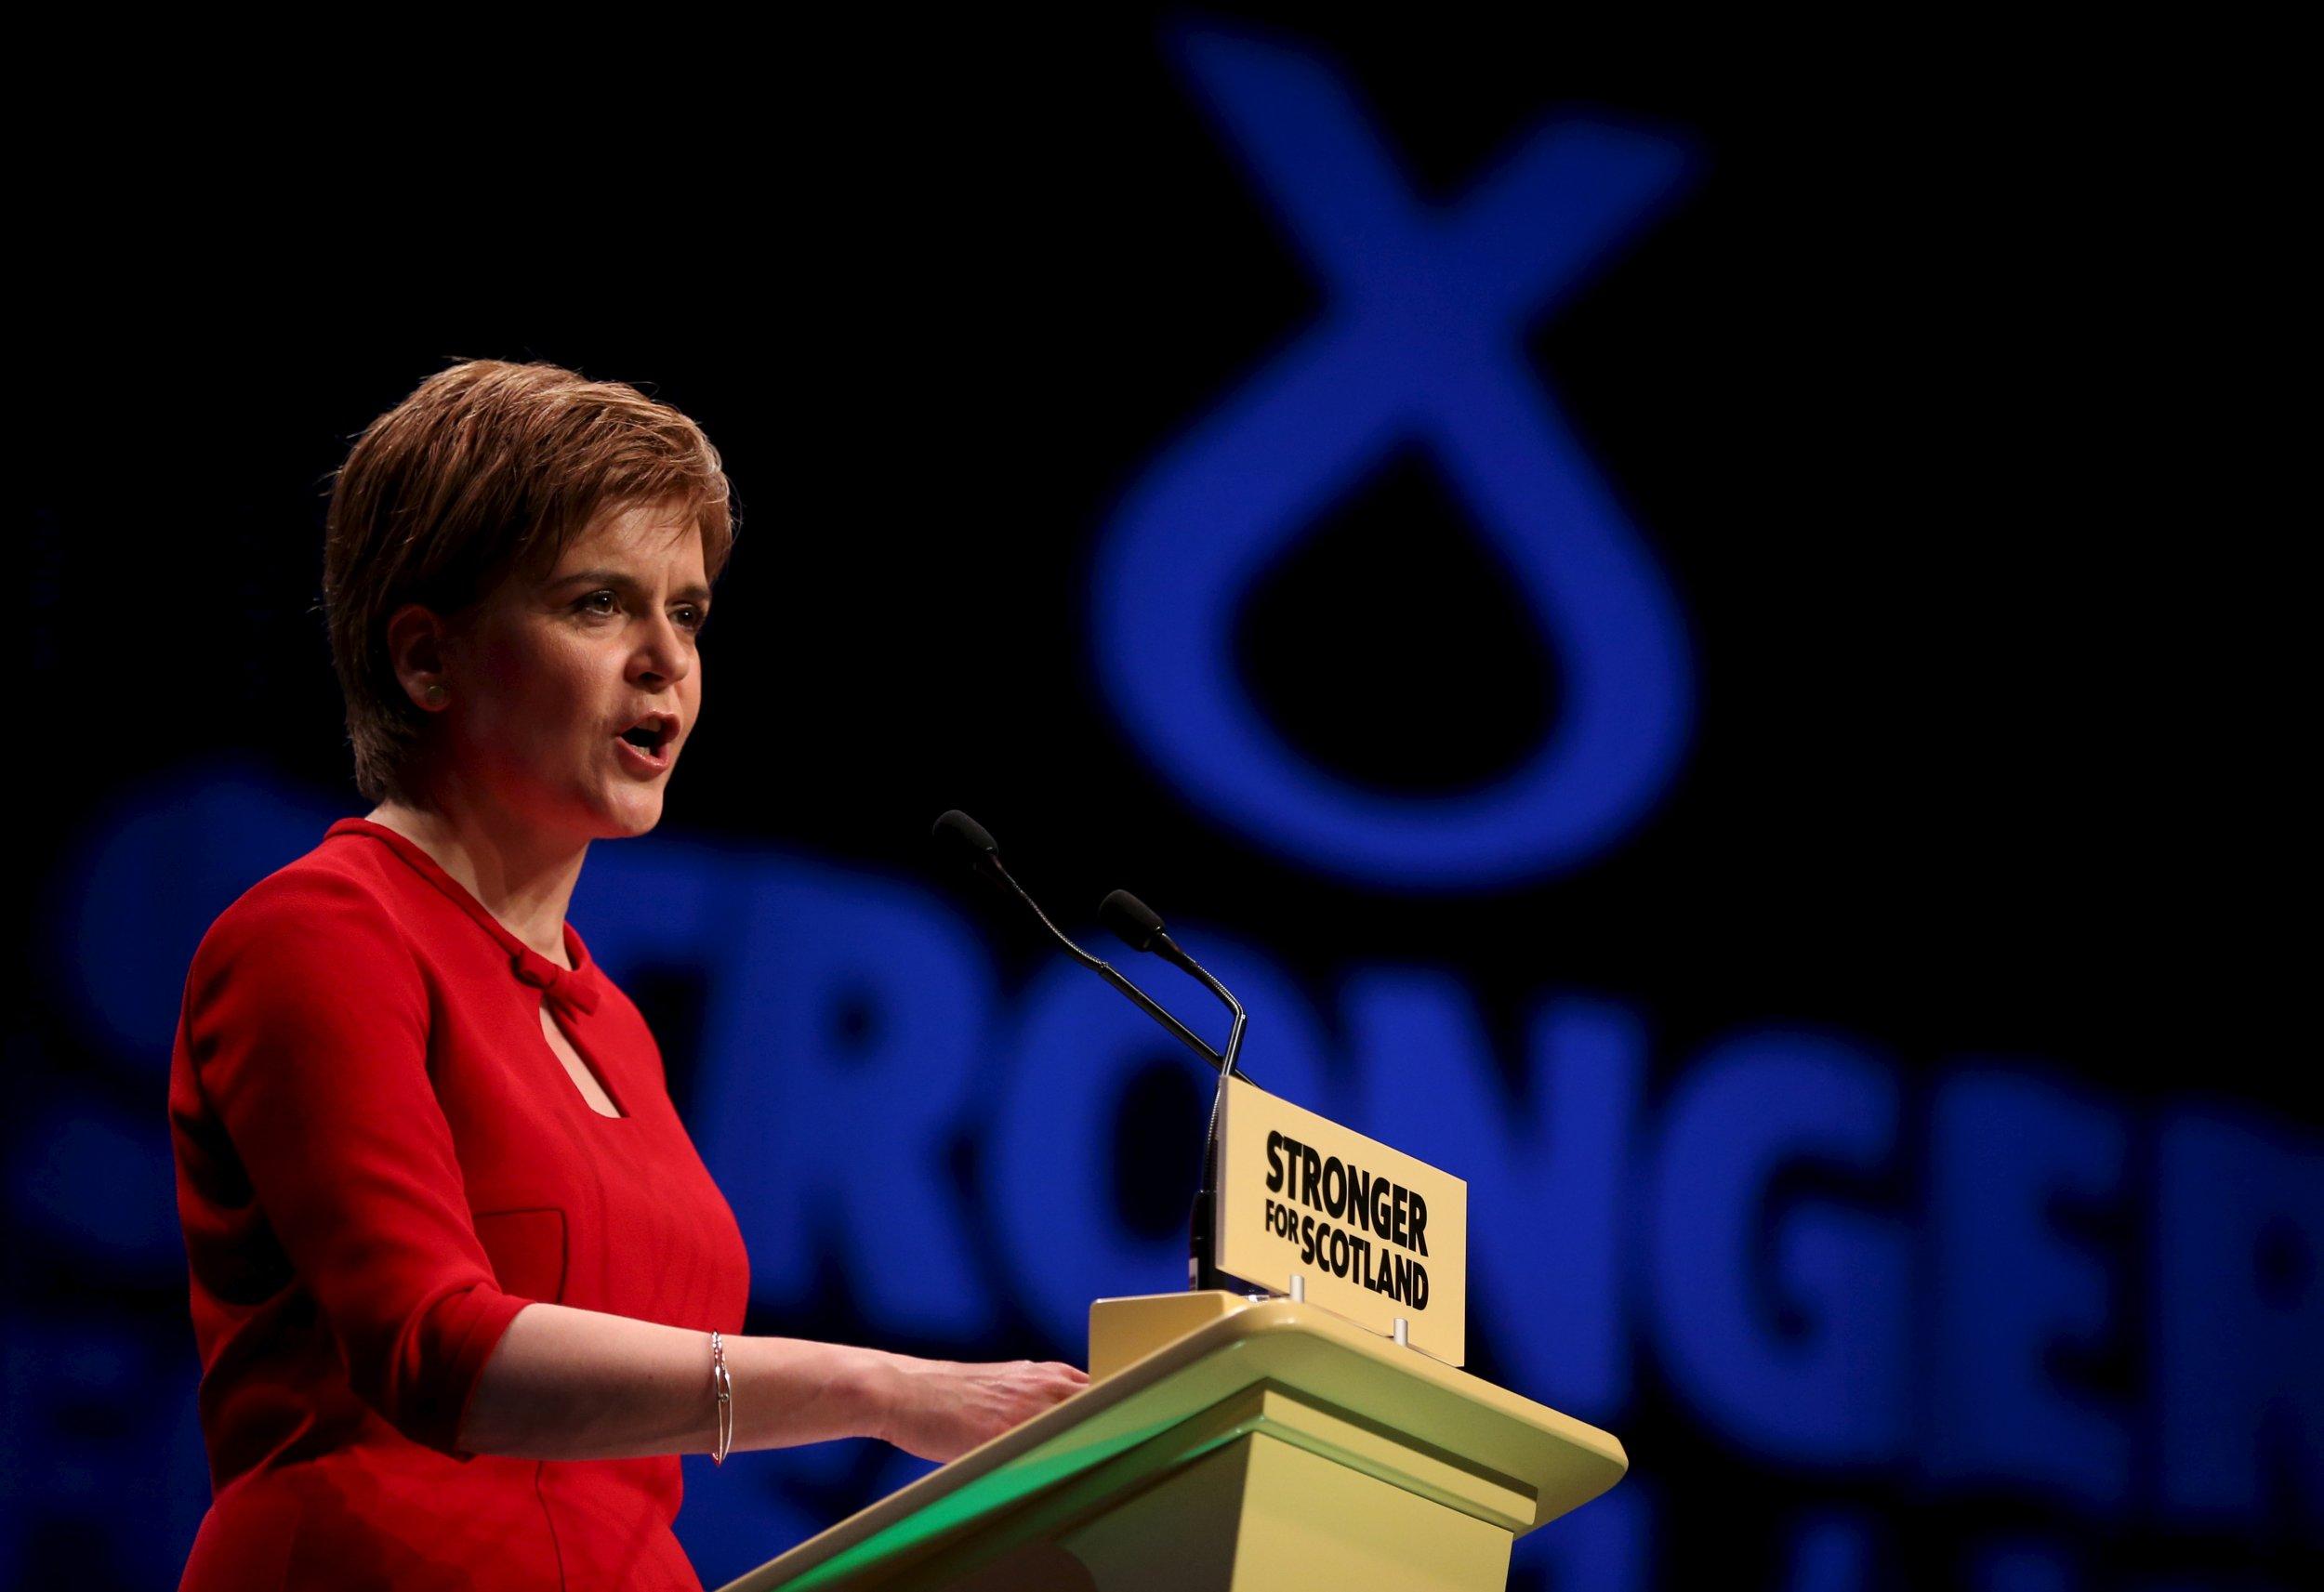 10_17_2015_scotland_sturgeon